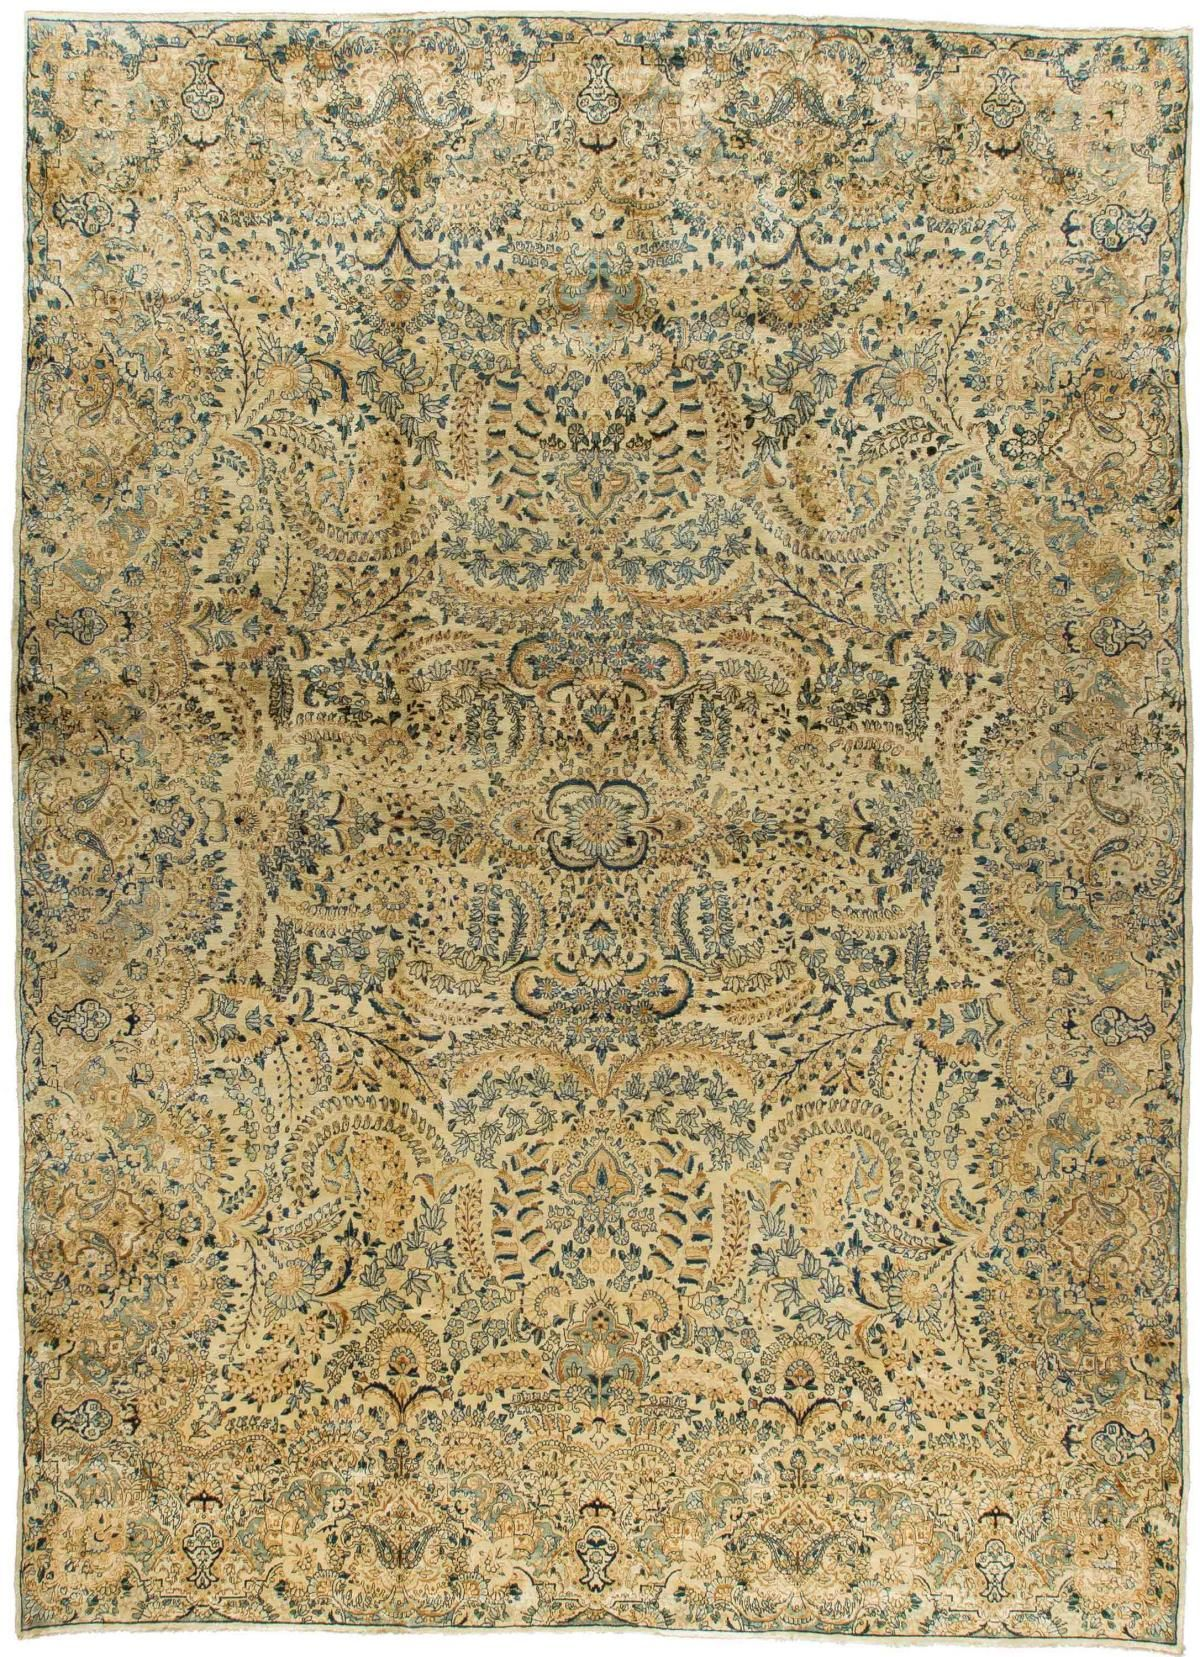 Rug Ant125694 Persian Kerman Antique Area Rugs By Safavieh Rugs Buying Carpet Wool Area Rugs